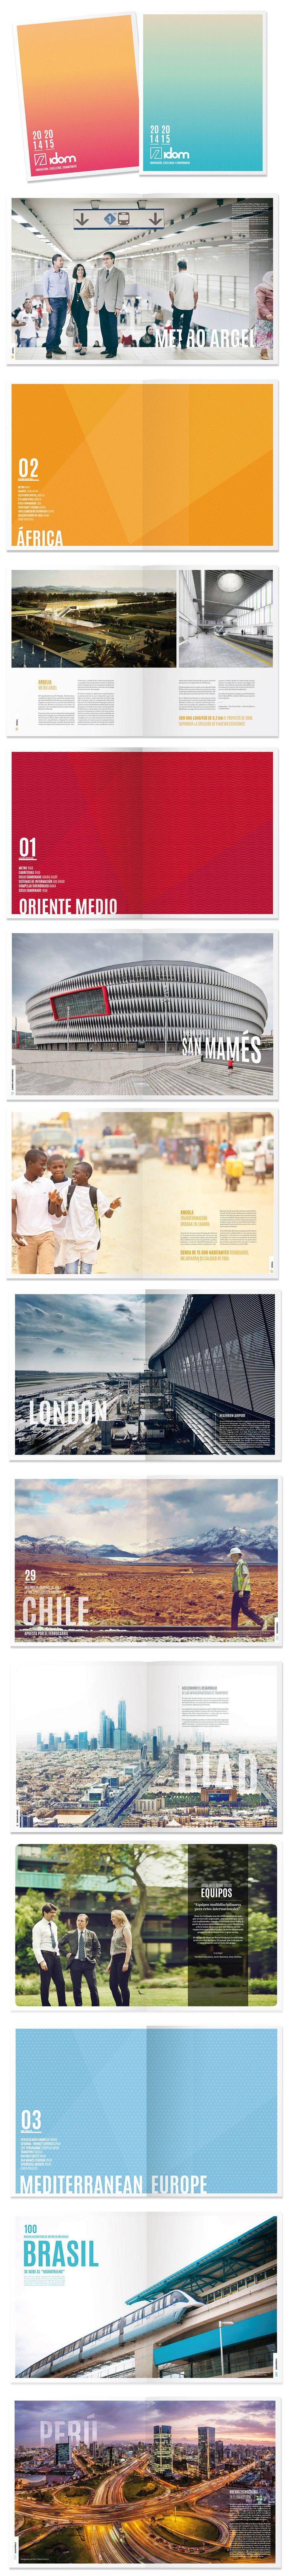 Annual Report 2014-2015 for Idom by Muak Studio #graphicdesign #editorialdesign http://www.muak.cc/